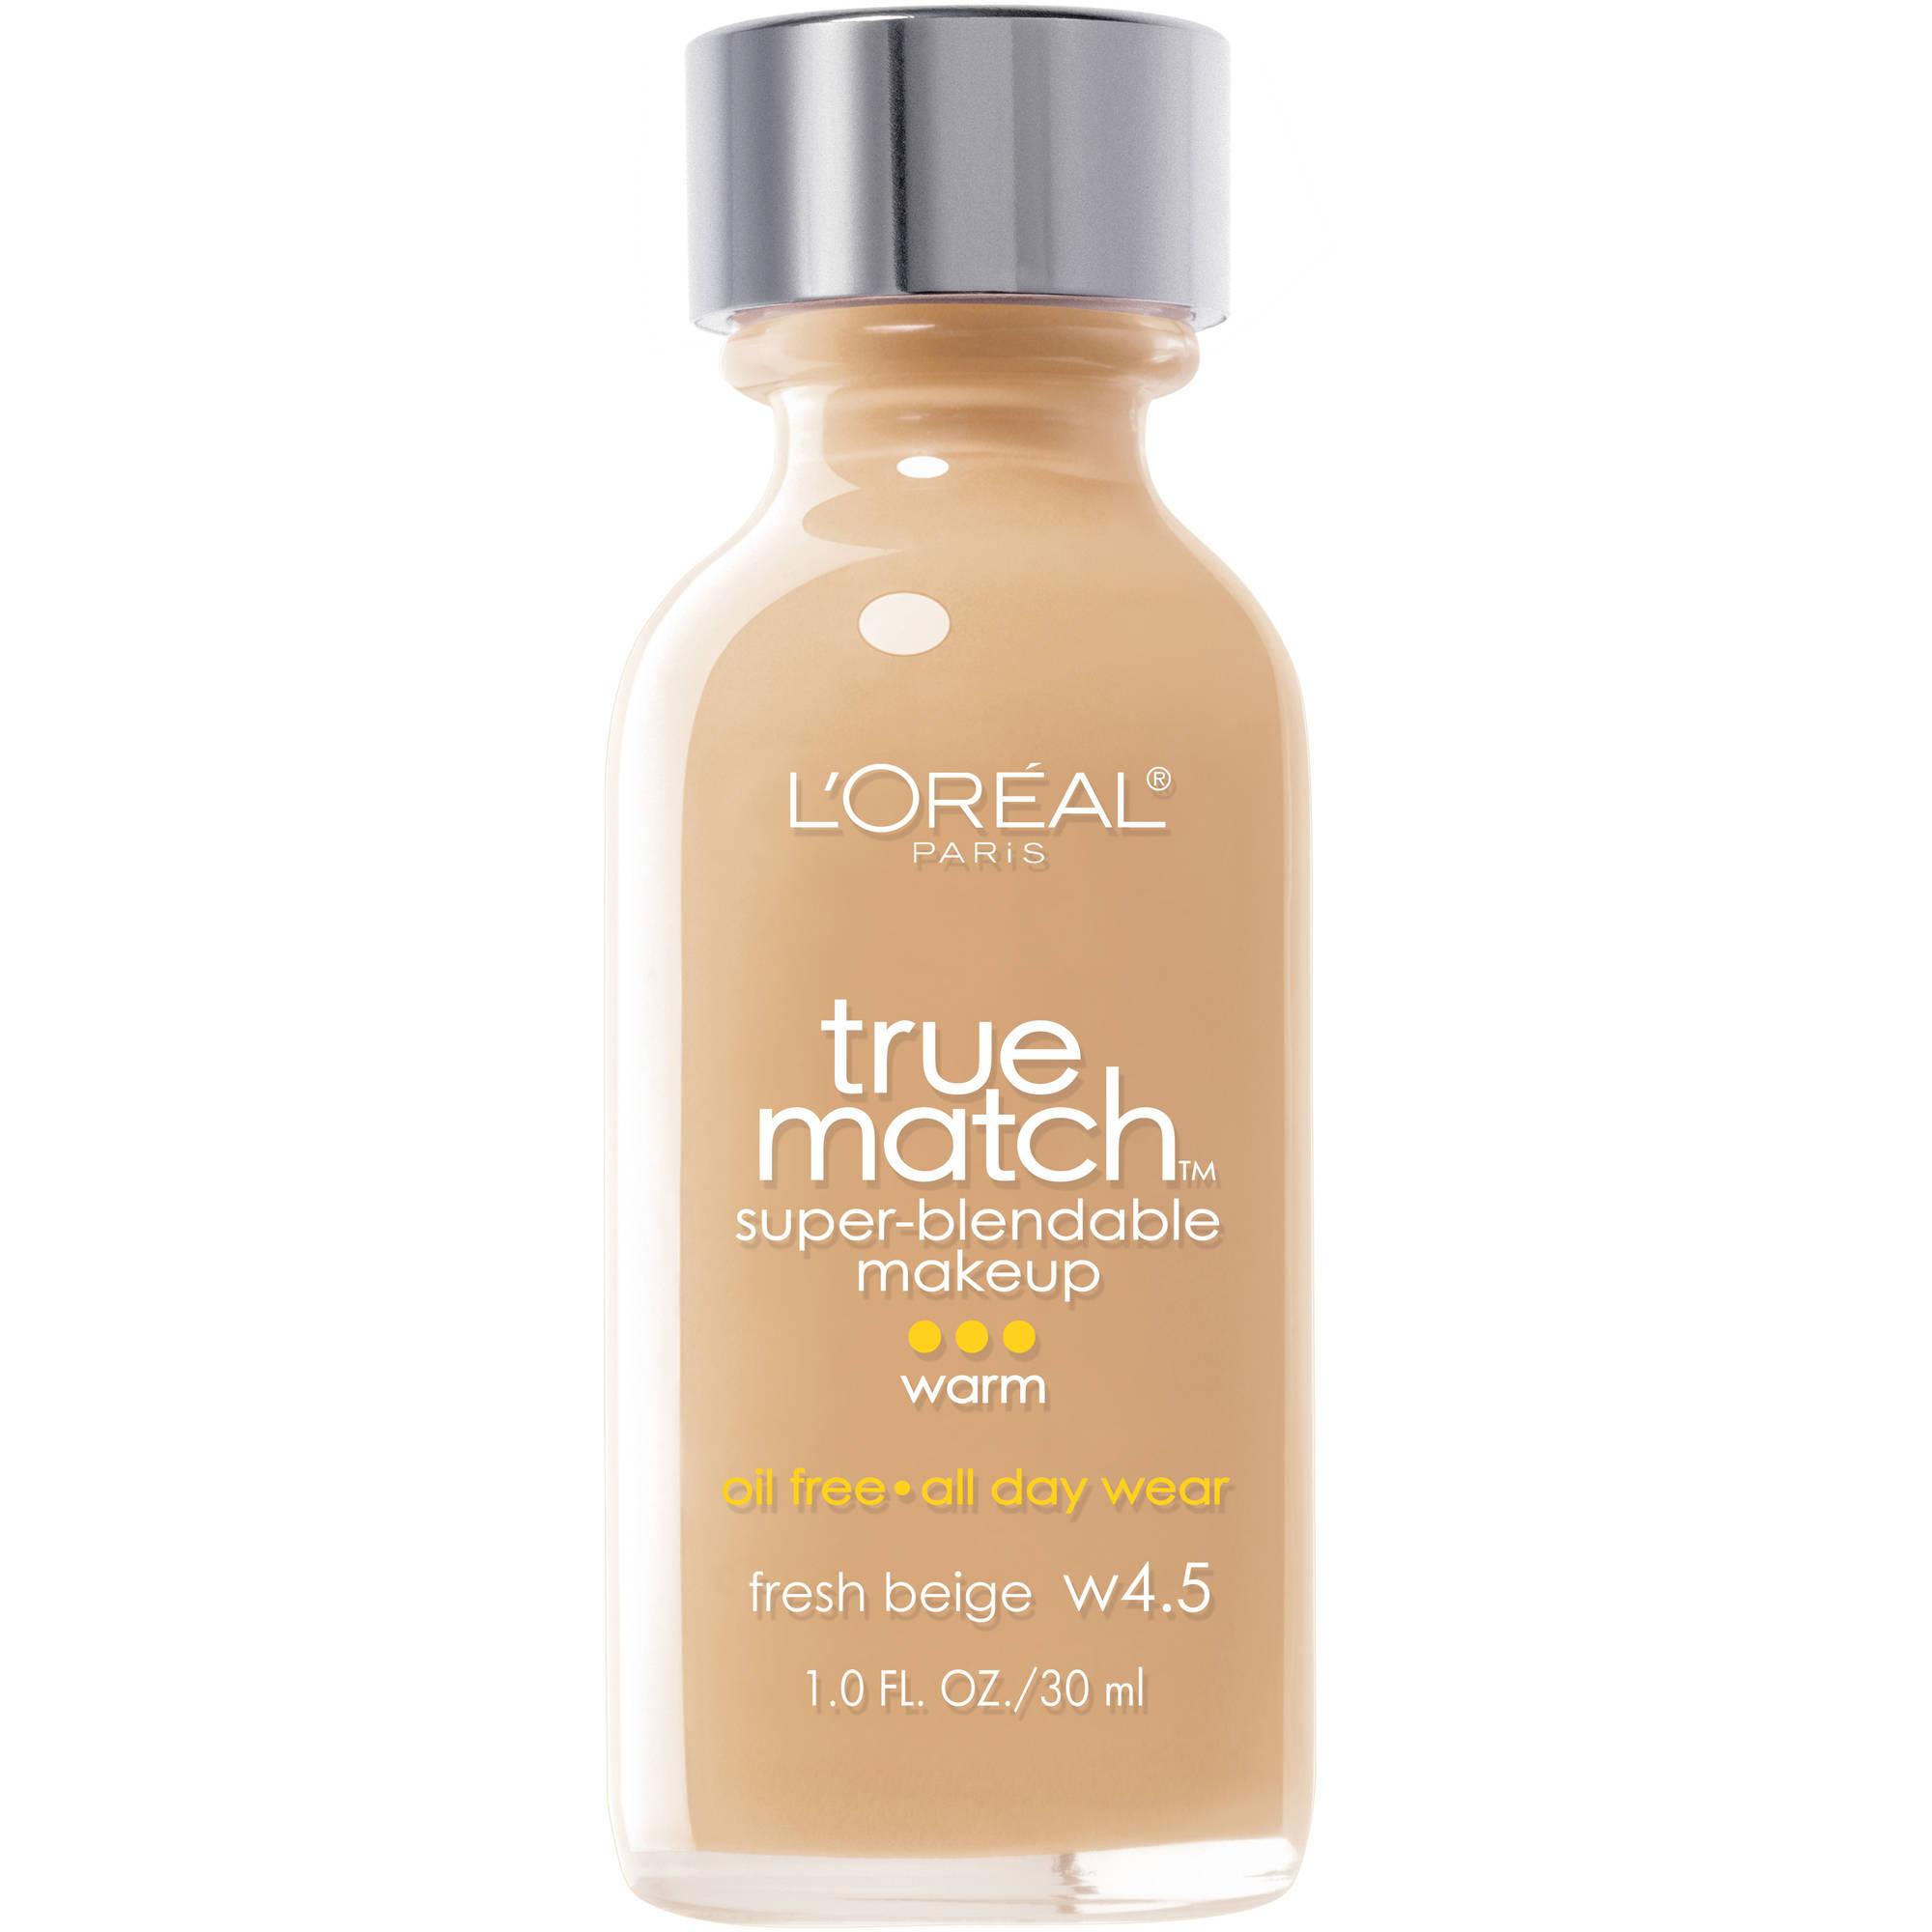 True Match Warm Fresh Beige W4.5 Superblendable Makeup, 1 fl oz